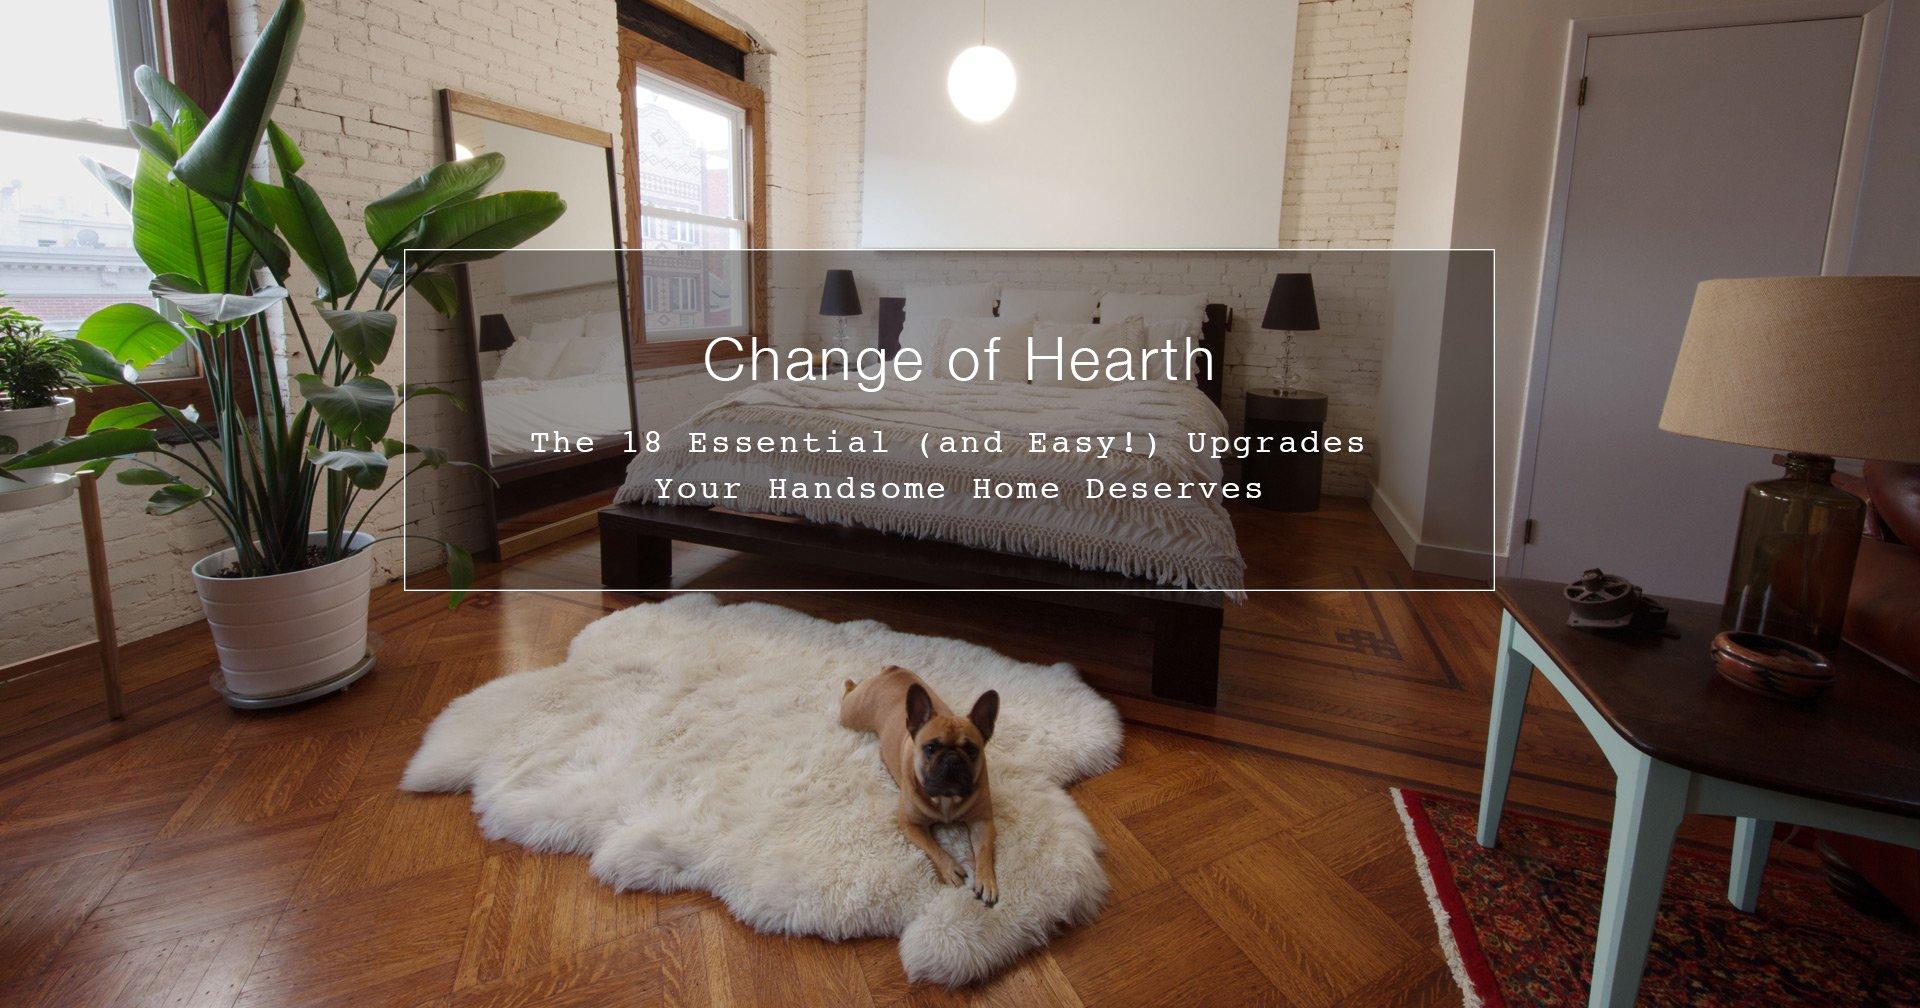 Change of Hearth